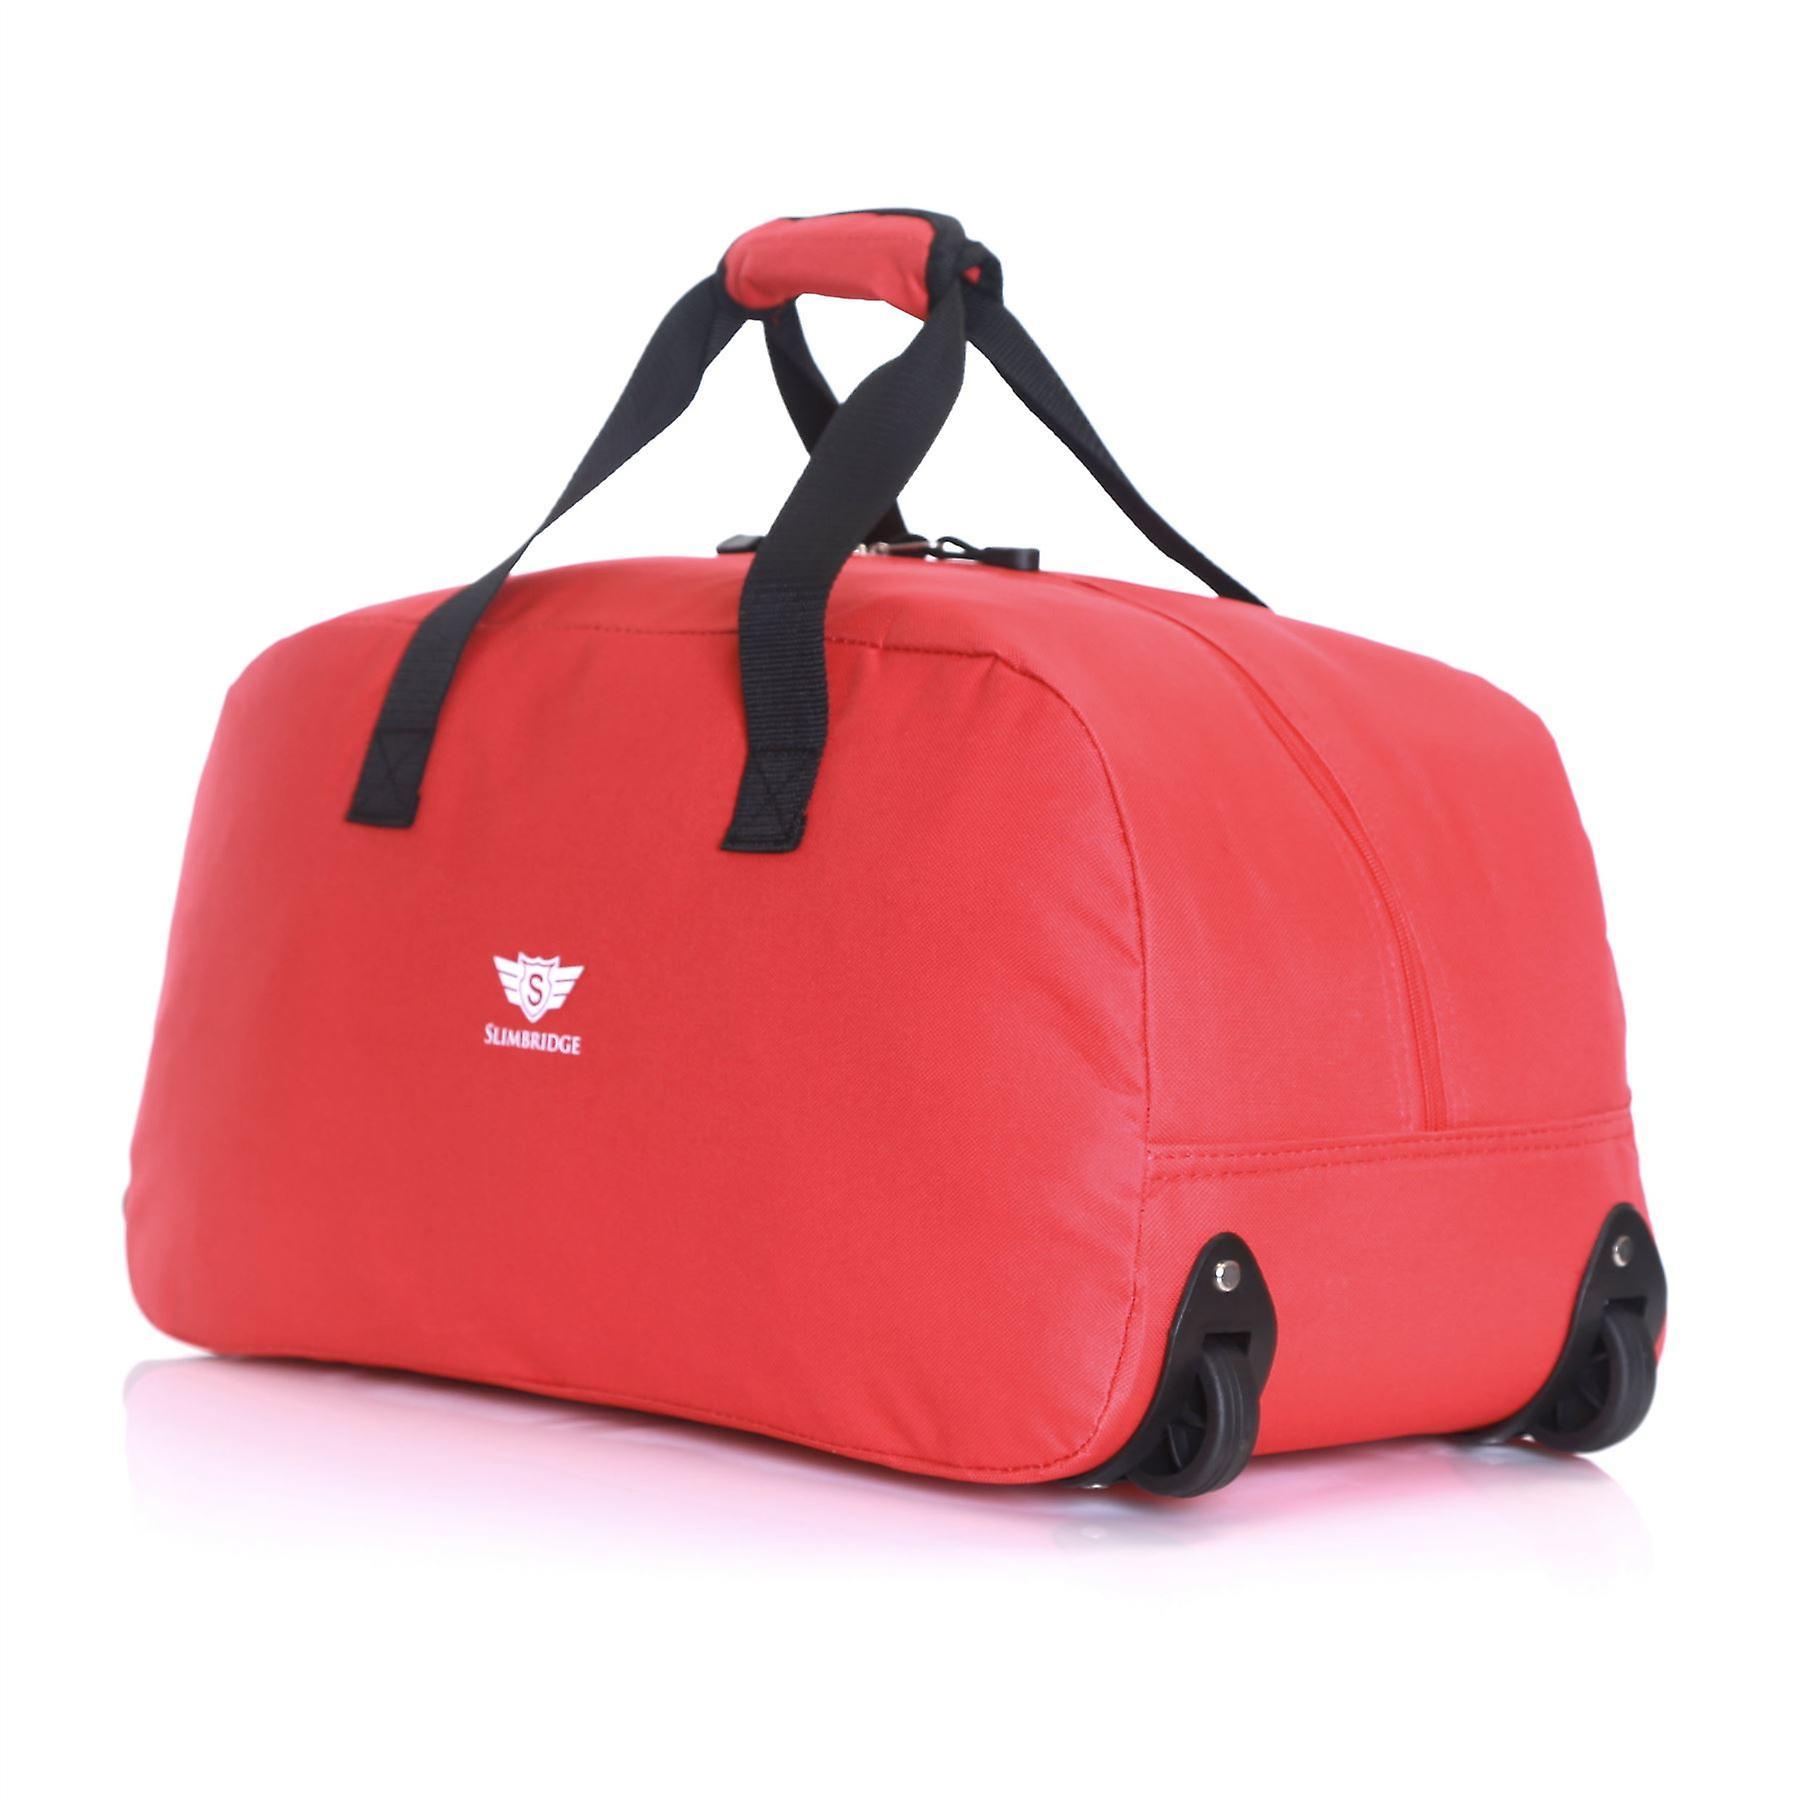 Slimbridge Castletown Cabin Approved Wheeled Bag, Red